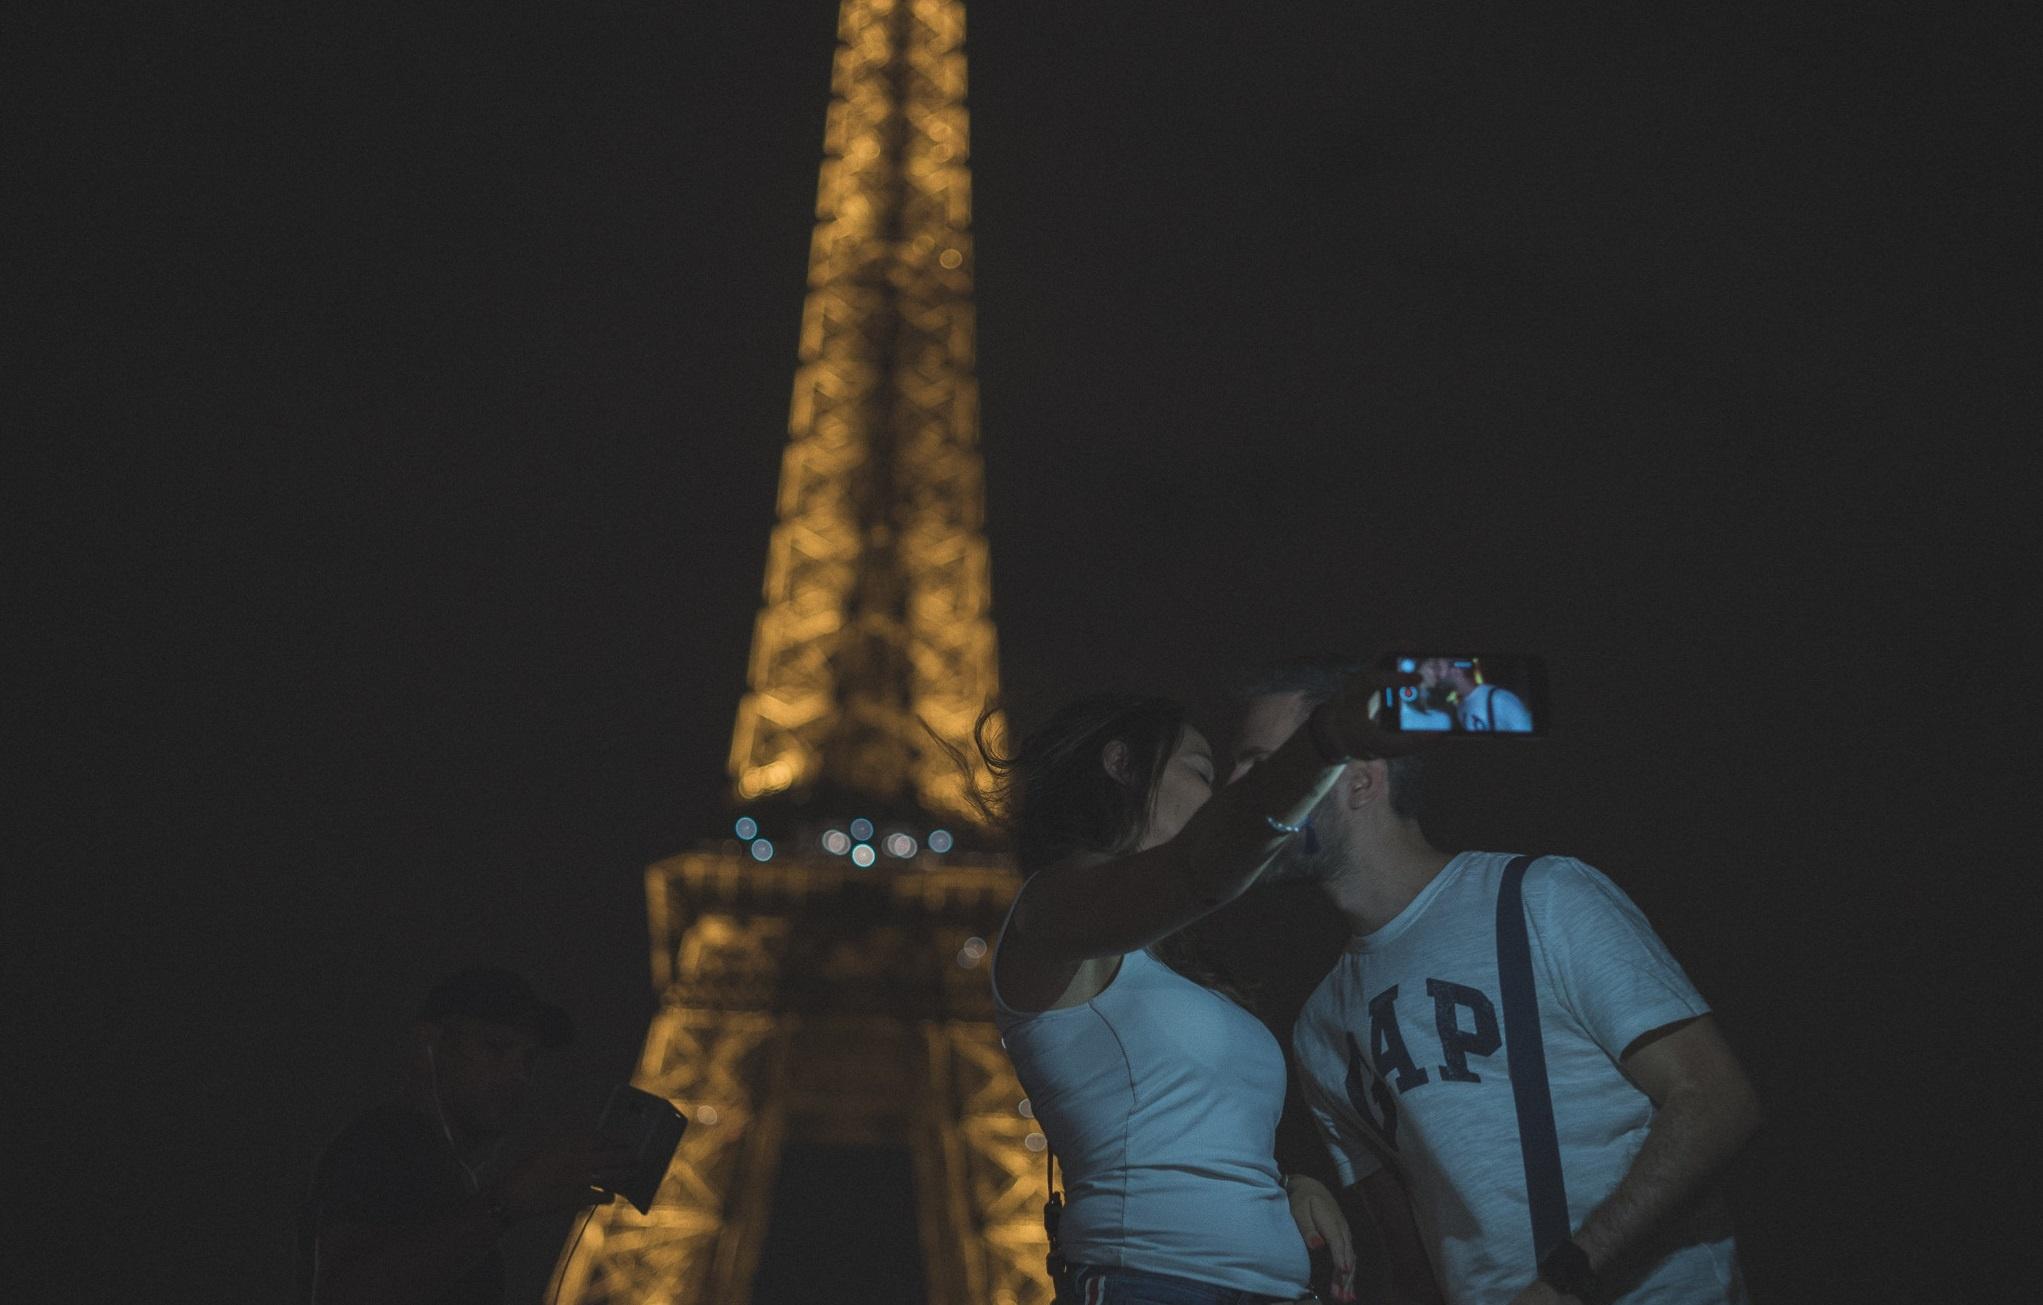 thanh pho Paris hoa le anh 45